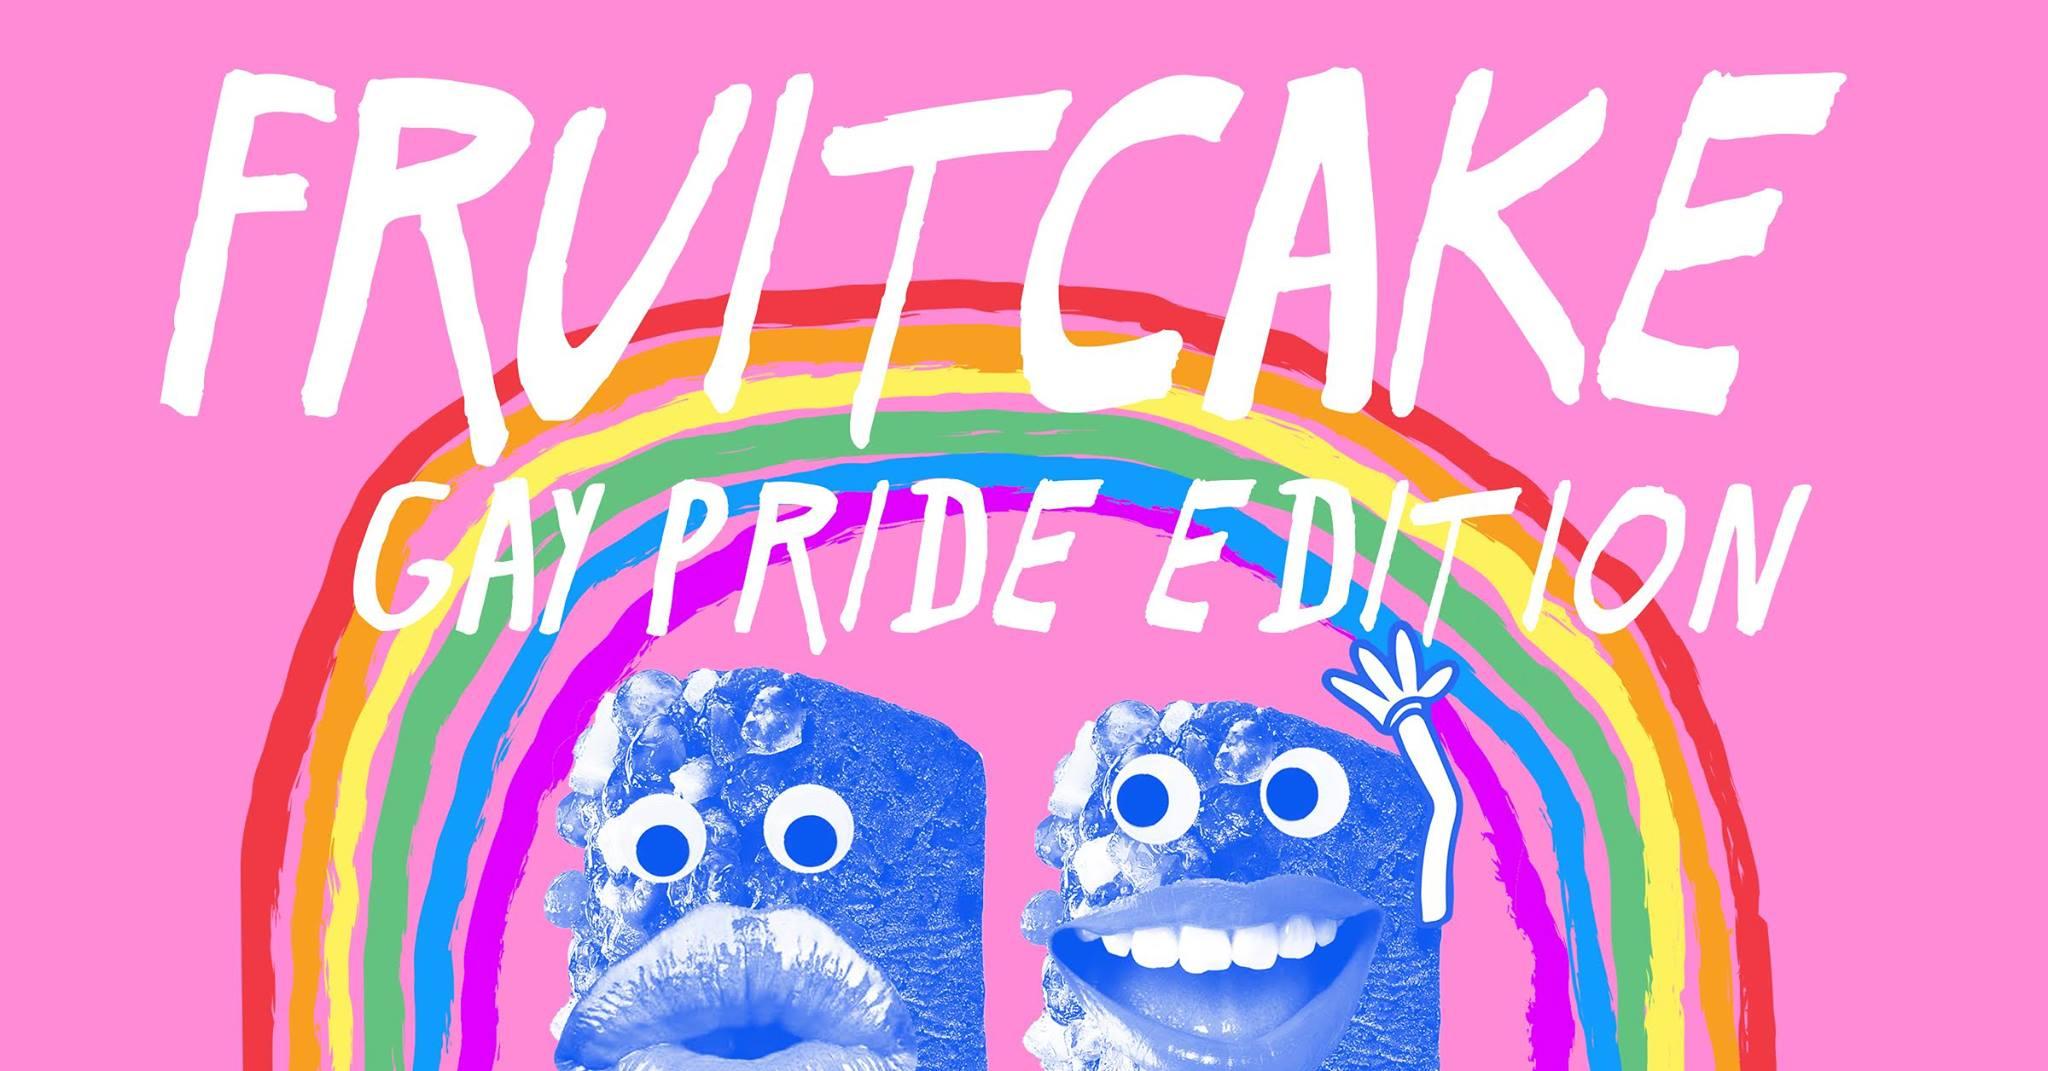 fruitcake teaser 2